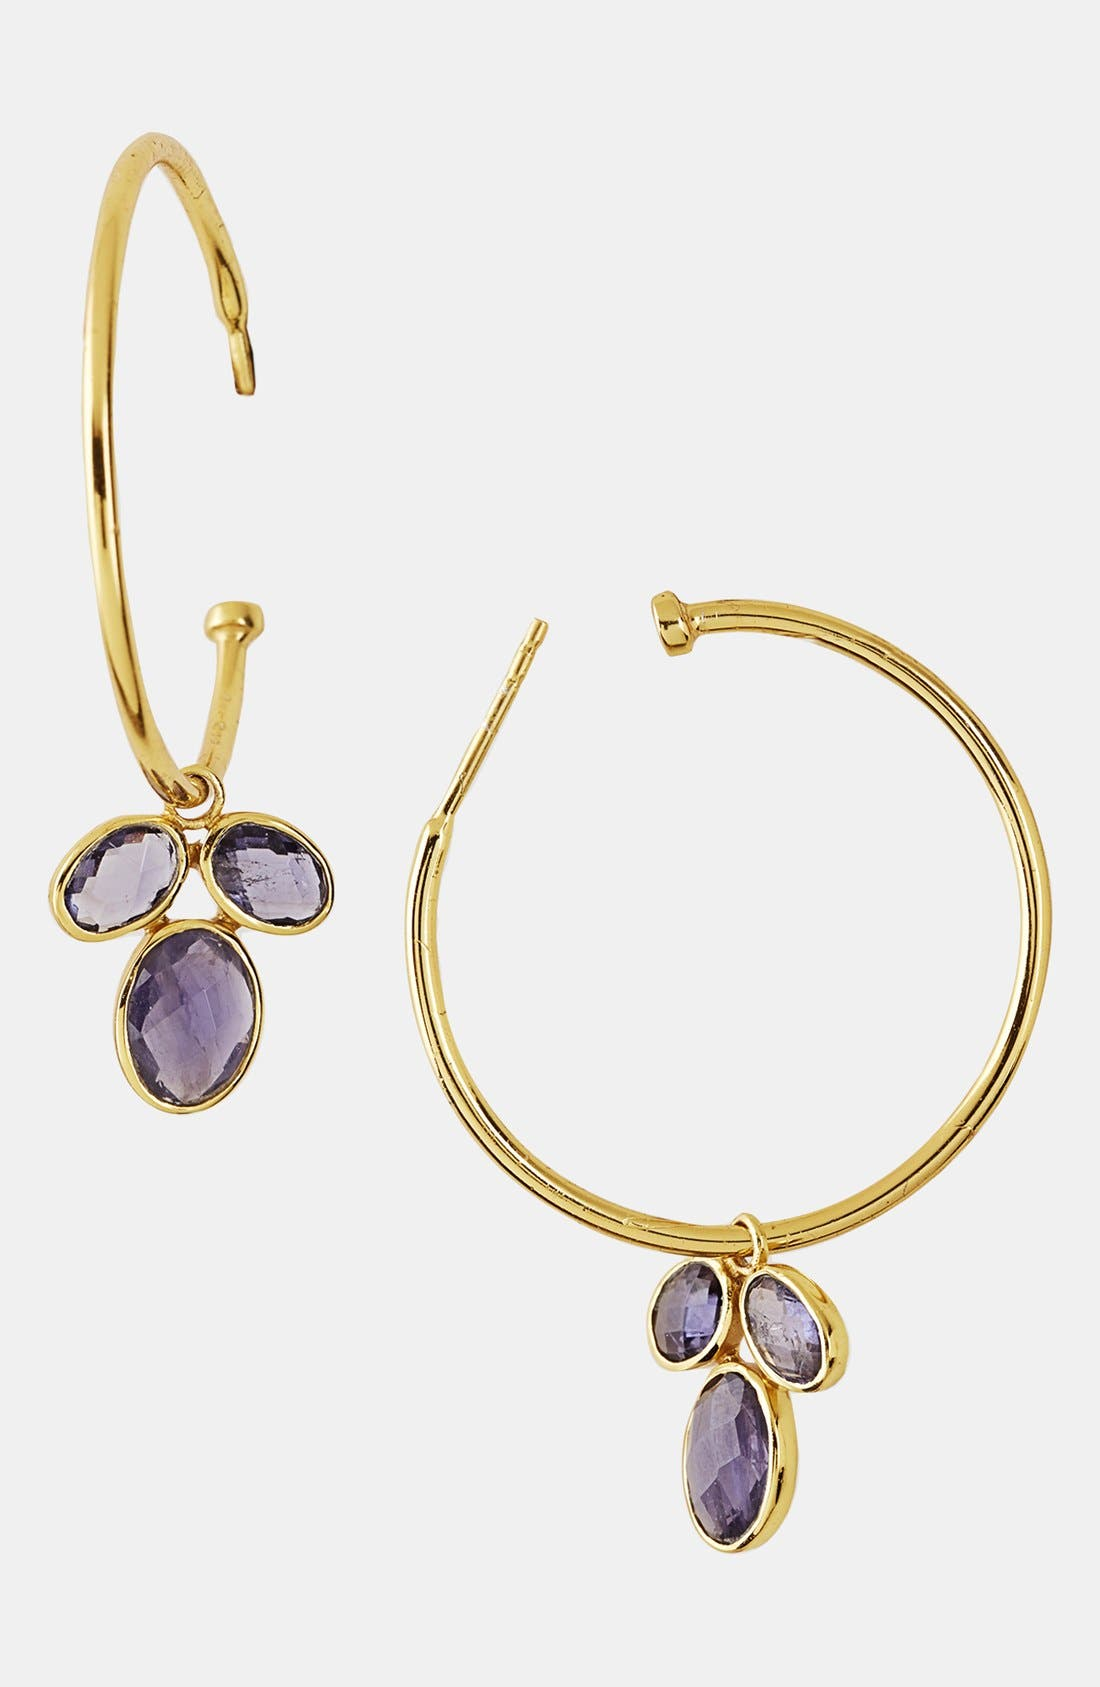 Main Image - Argento Vivo Cluster Charm Hoop Earrings